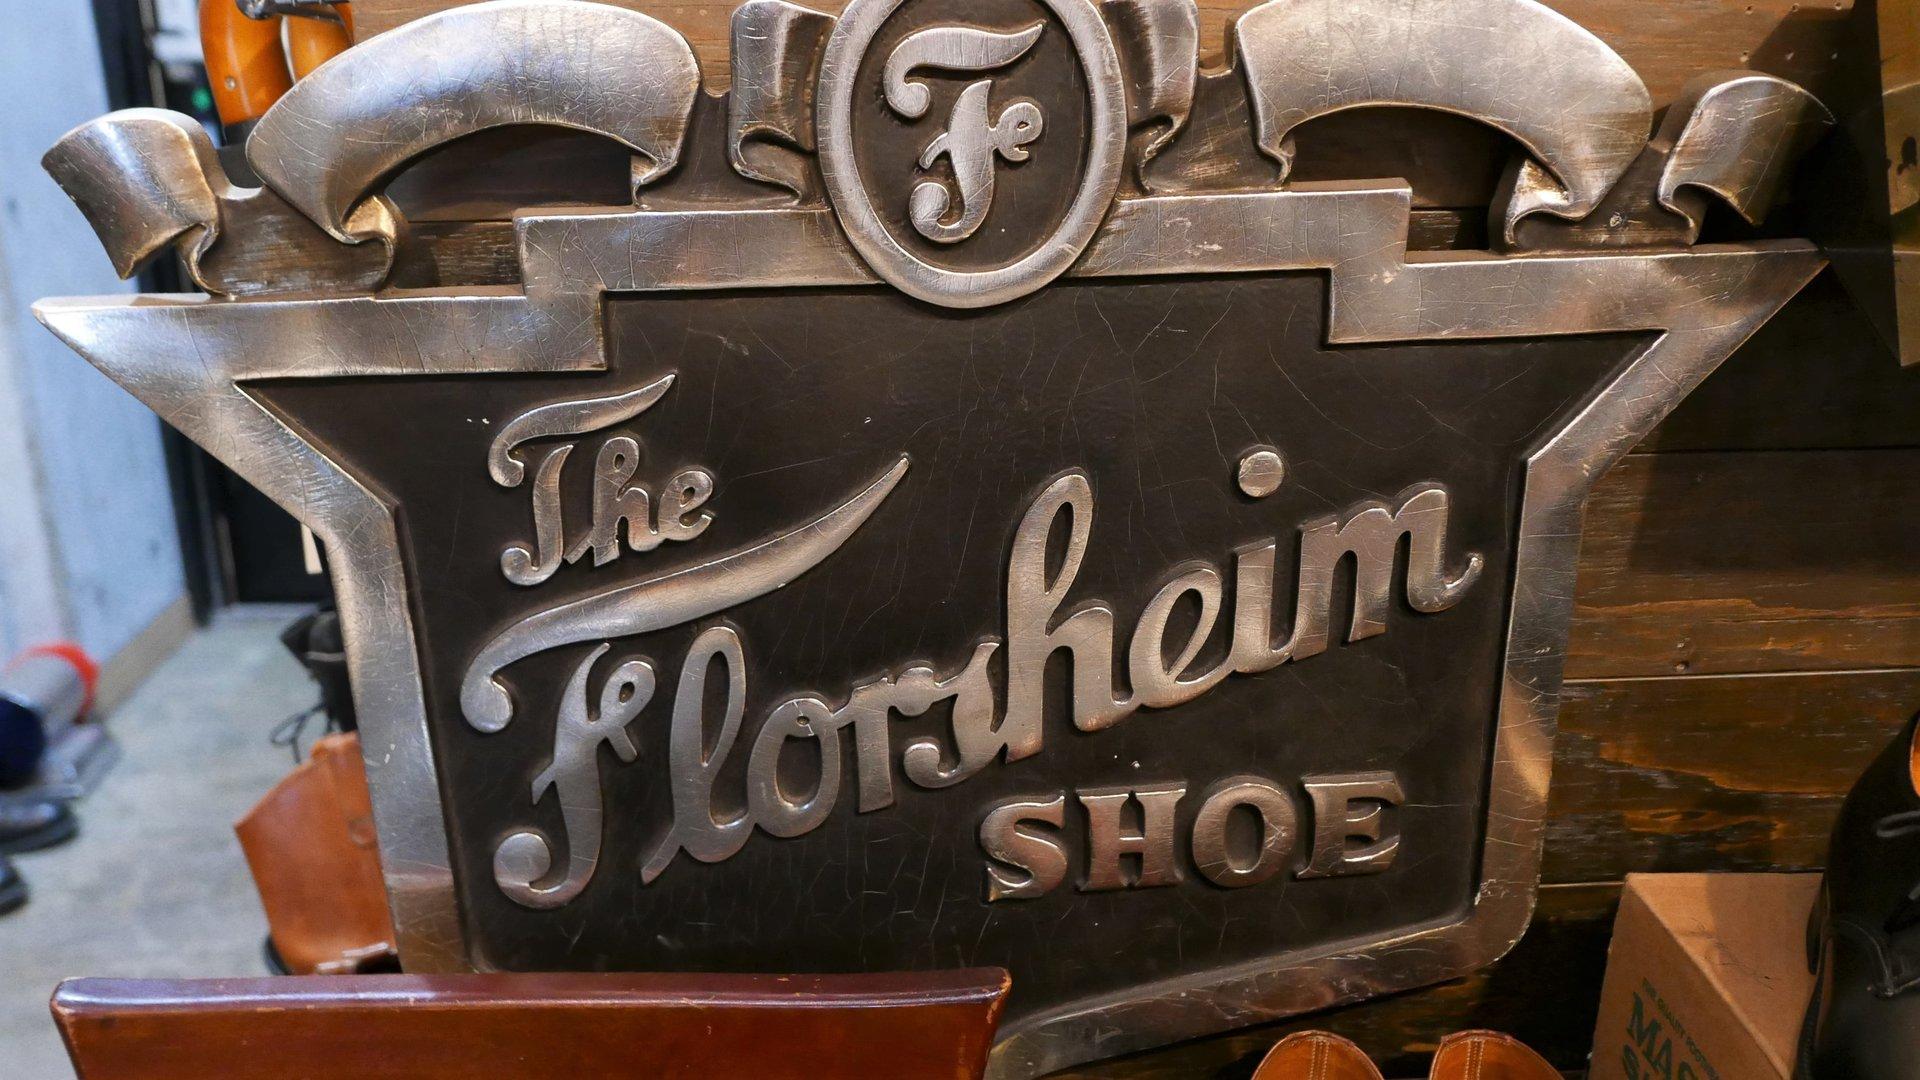 Florsheim Shoes Sign